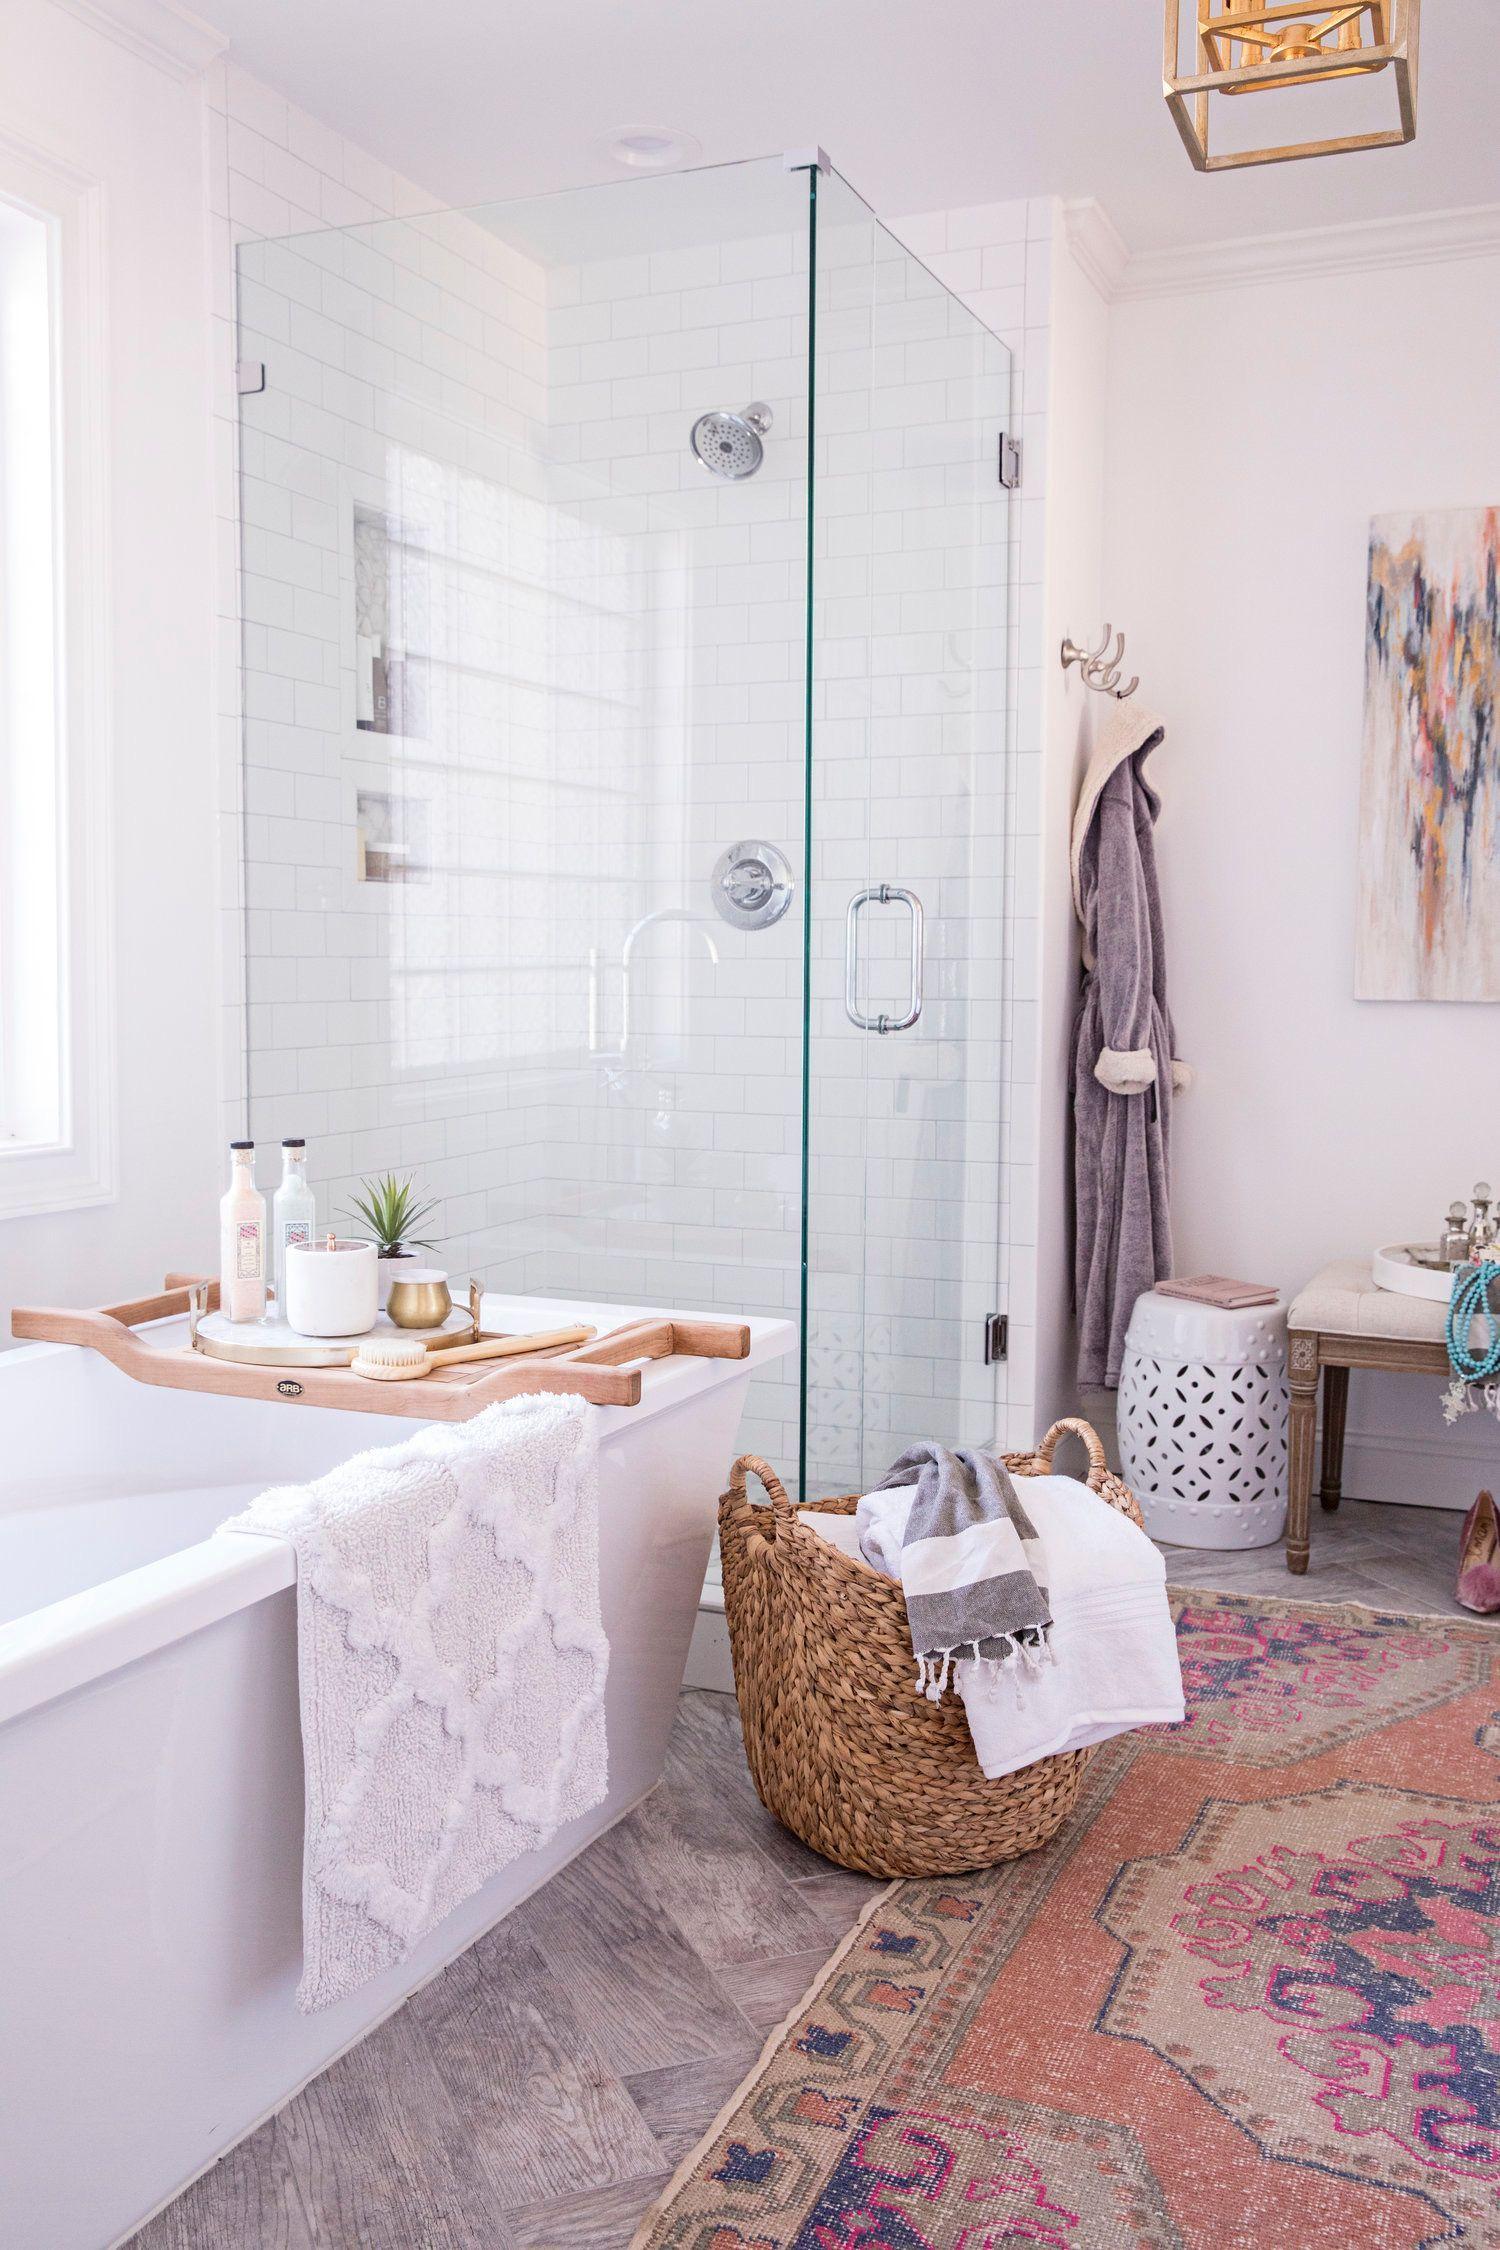 Bathroom Rug Ideas Bathrooms Rugs Home Decor Designs Ideas